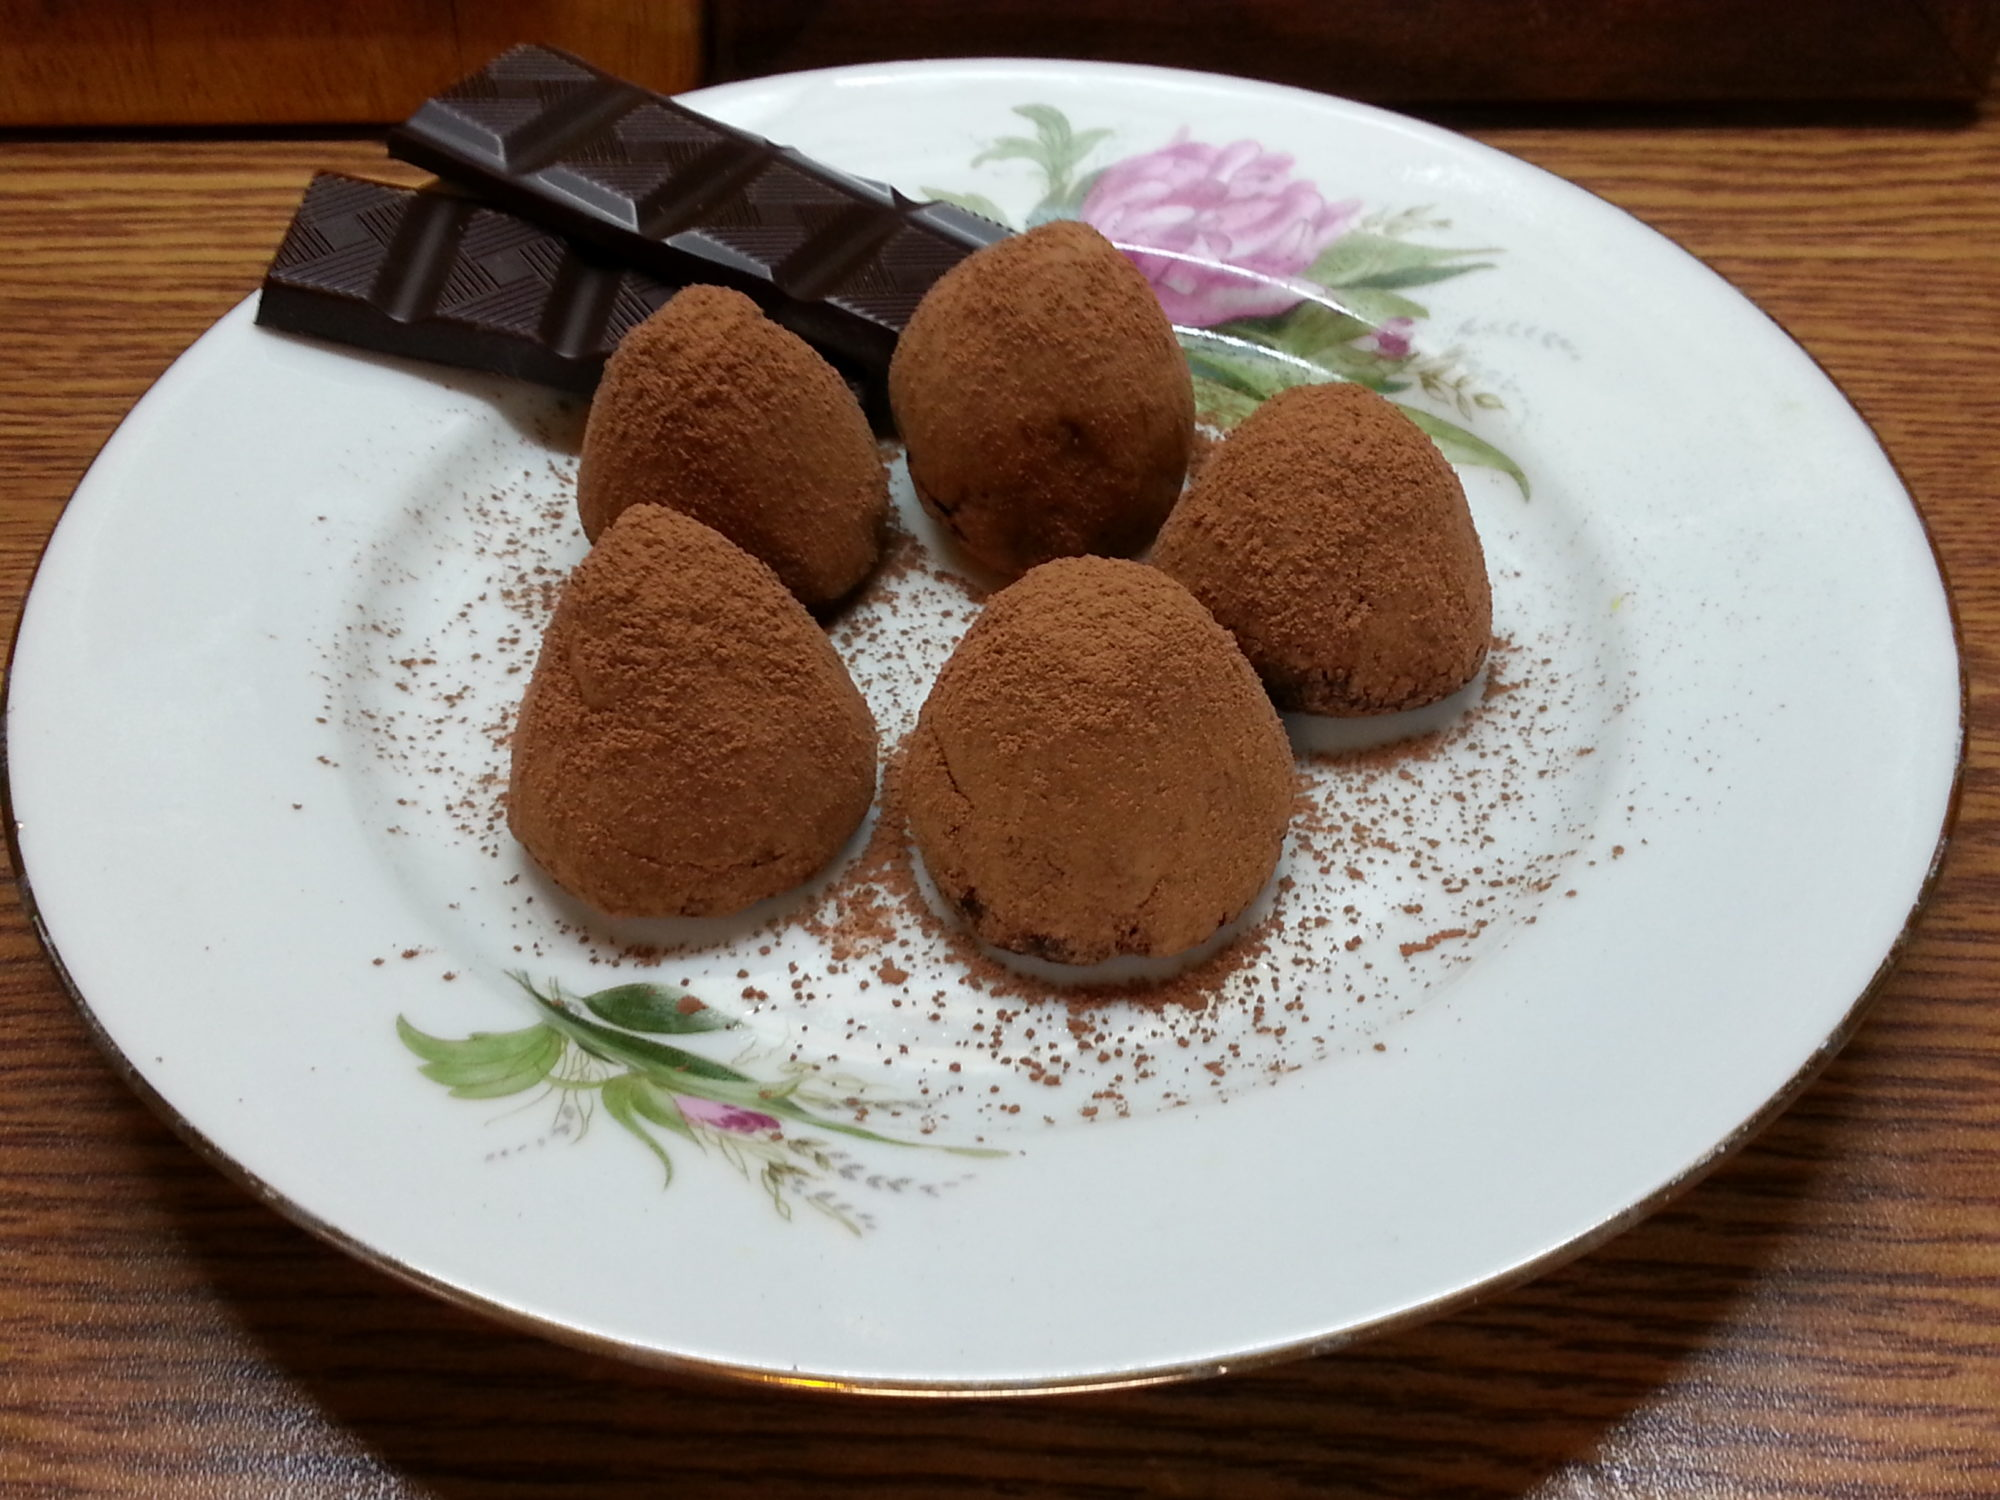 LCHF-конфеты «Трюфель»